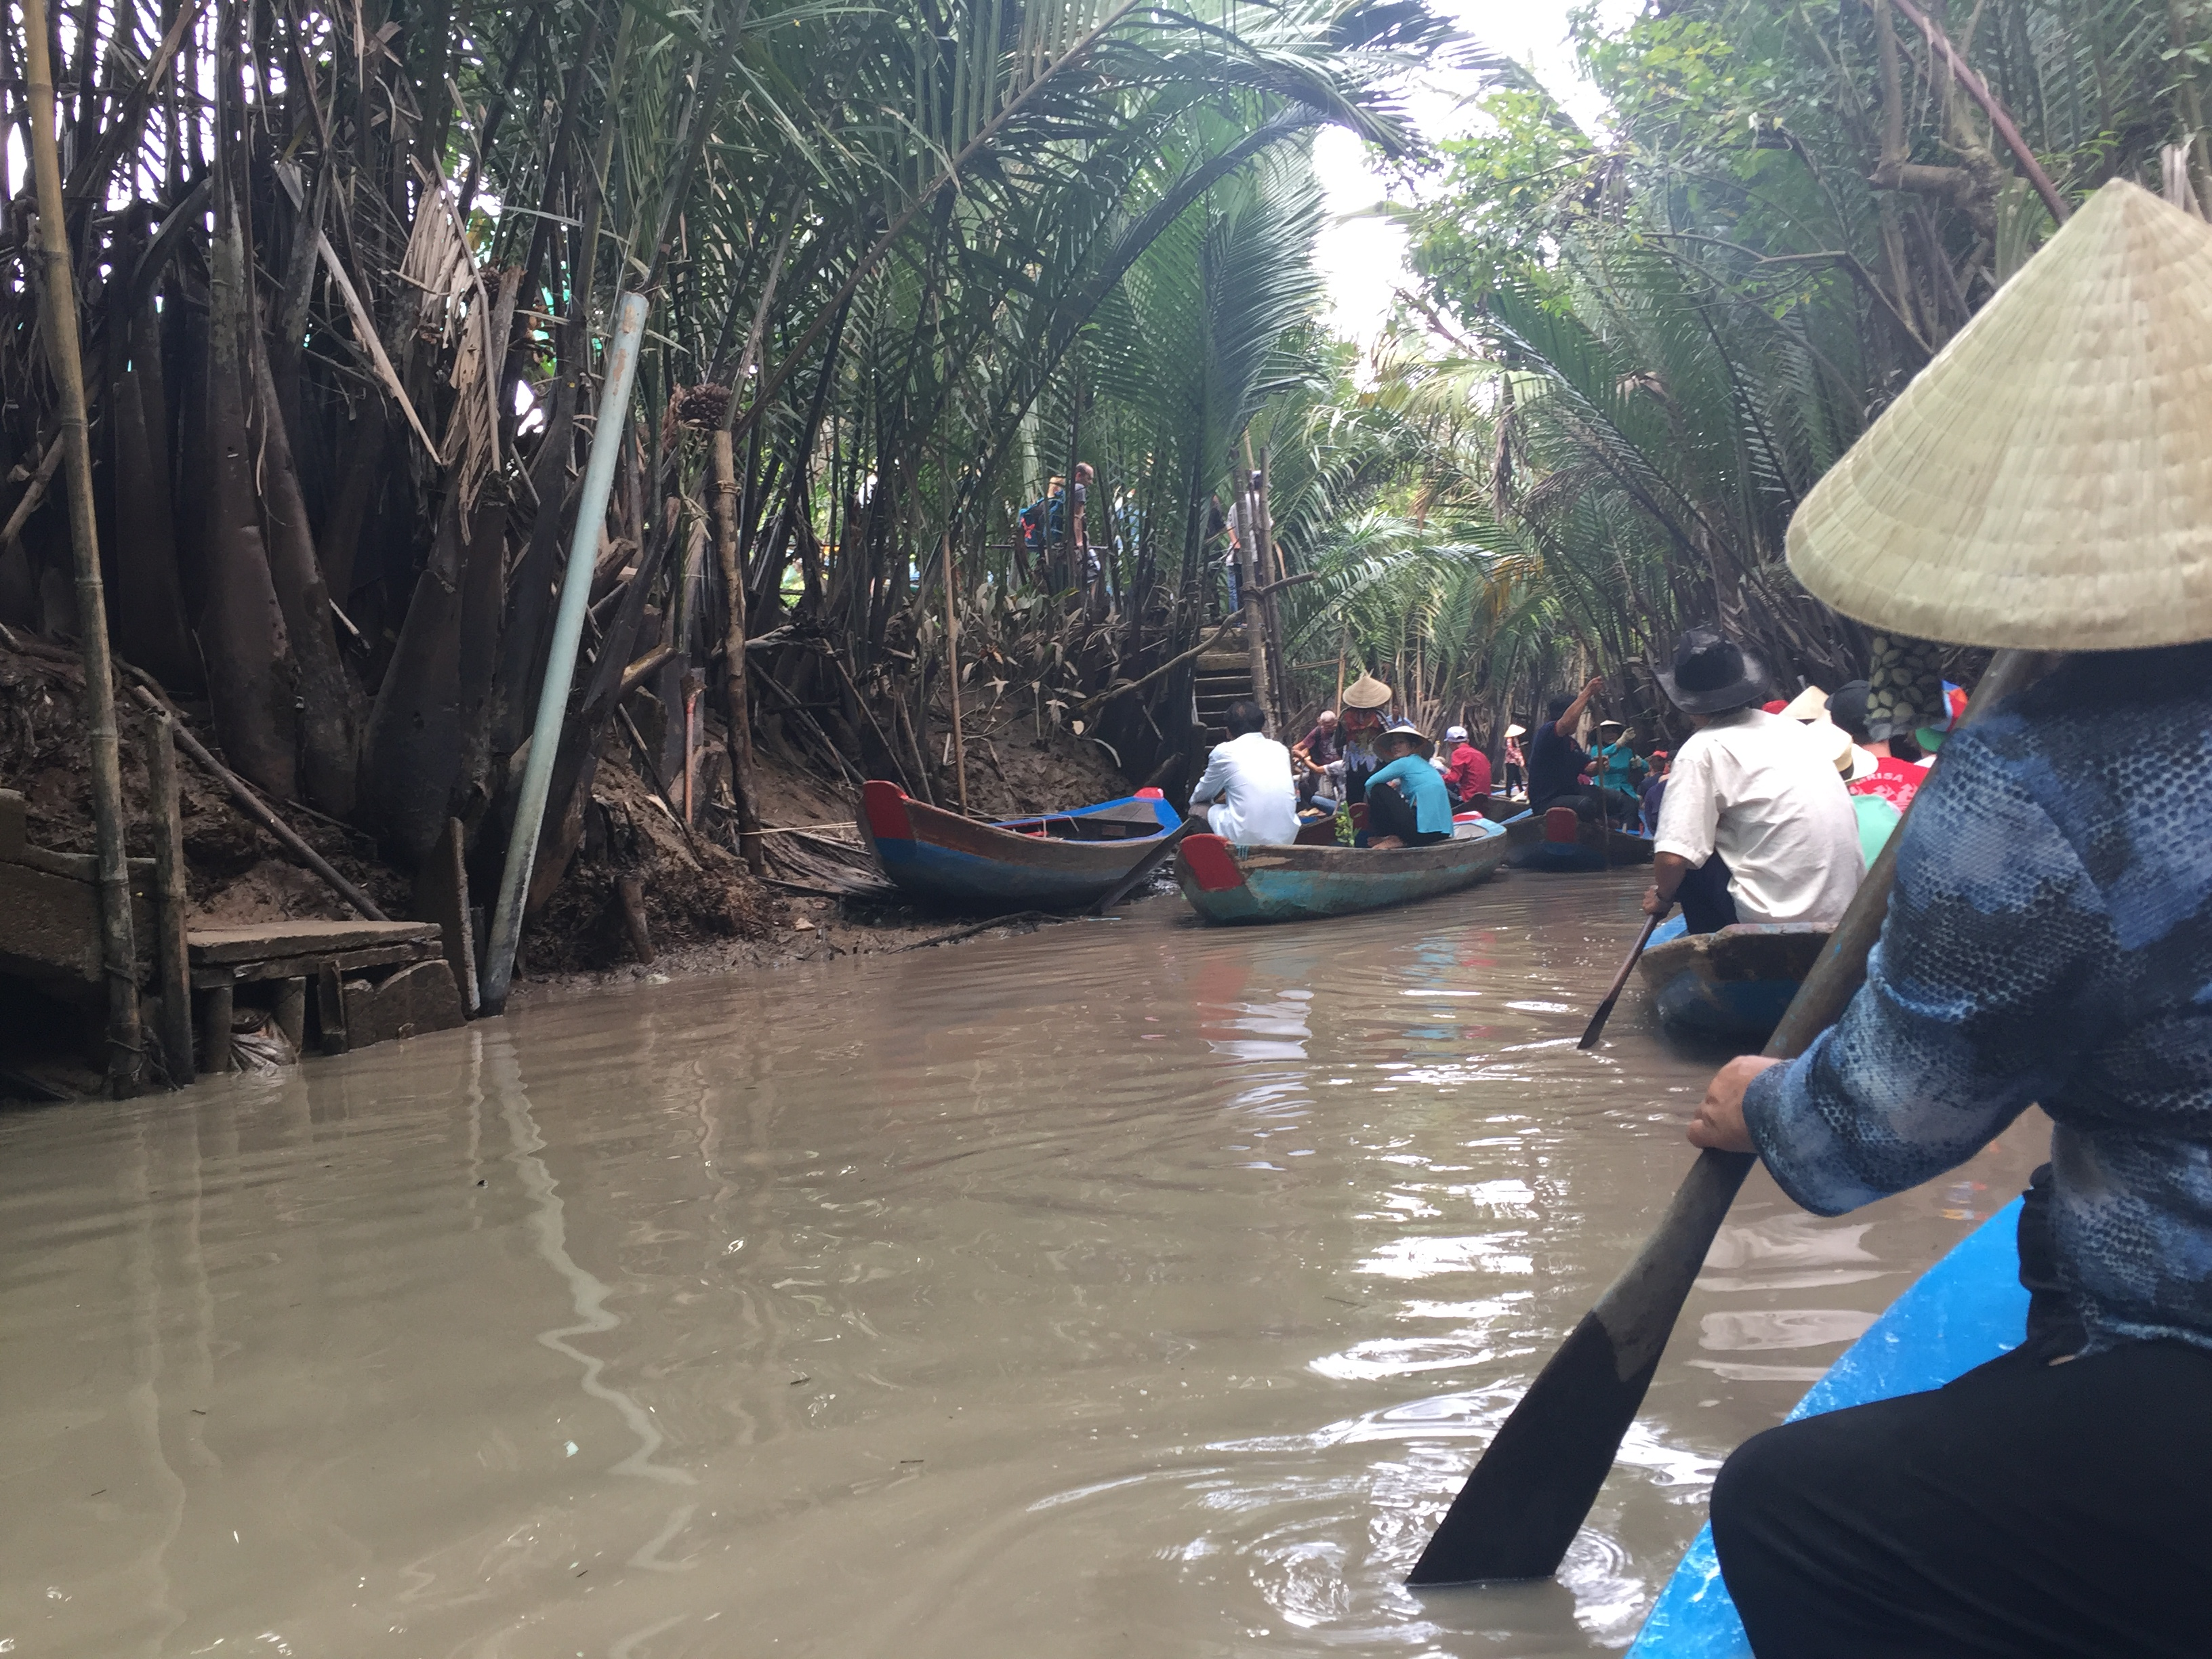 Riverboat on the Mekong Delta, Vietnam